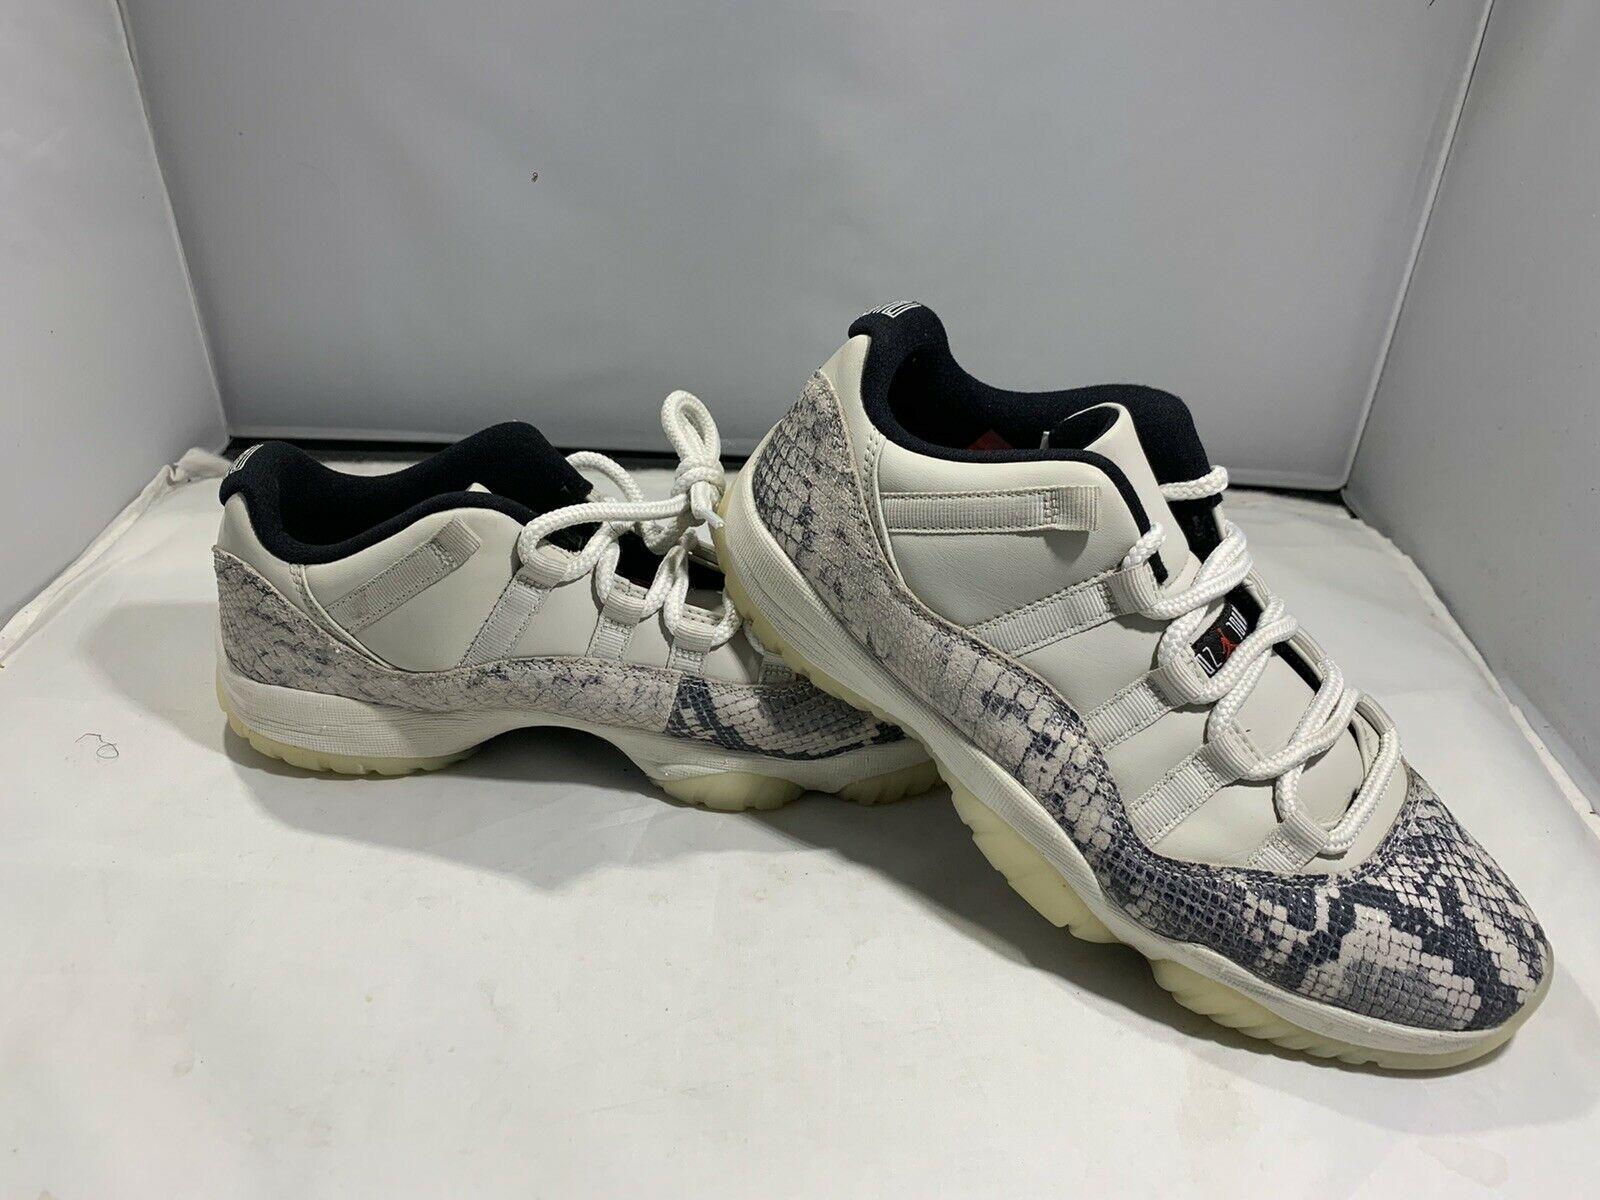 Jordan 11 Retro Low Snake Light Bone